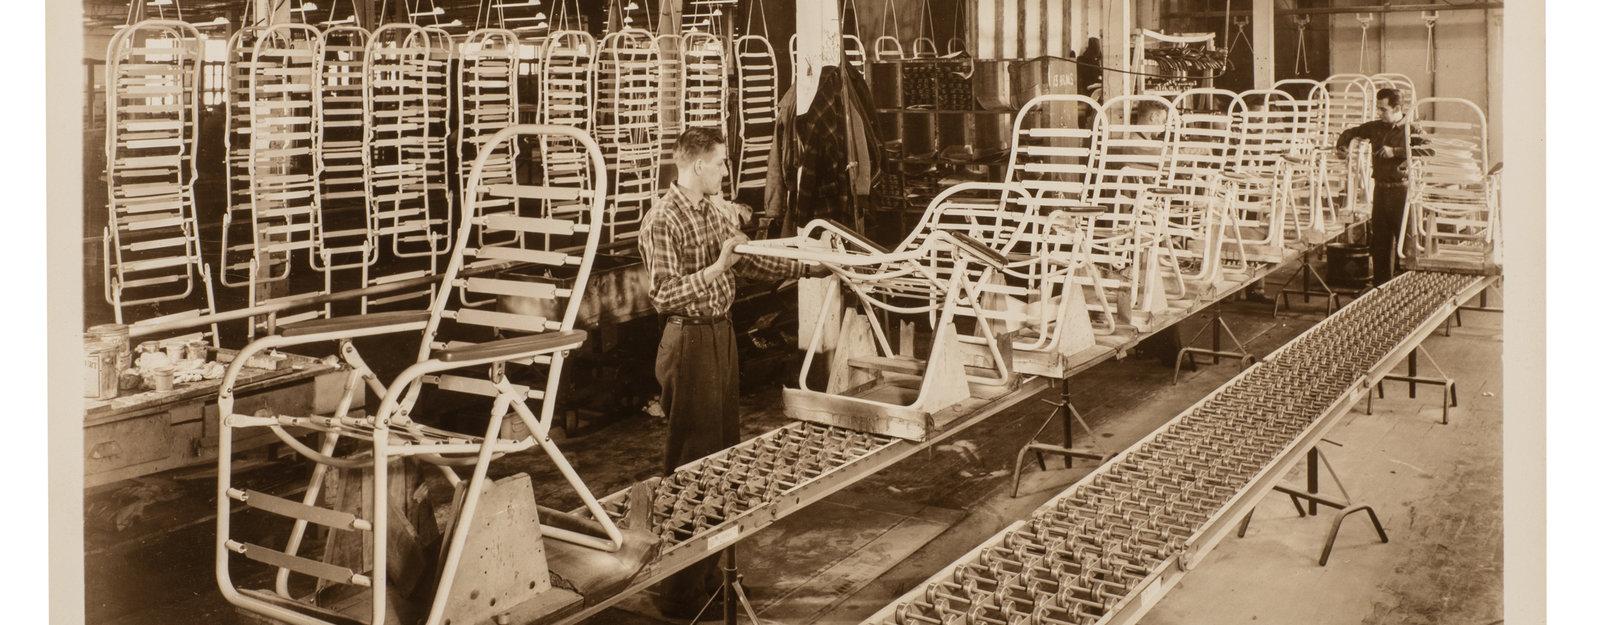 Meet Anton Lorenz, the Man Who Brought Tubular Steel